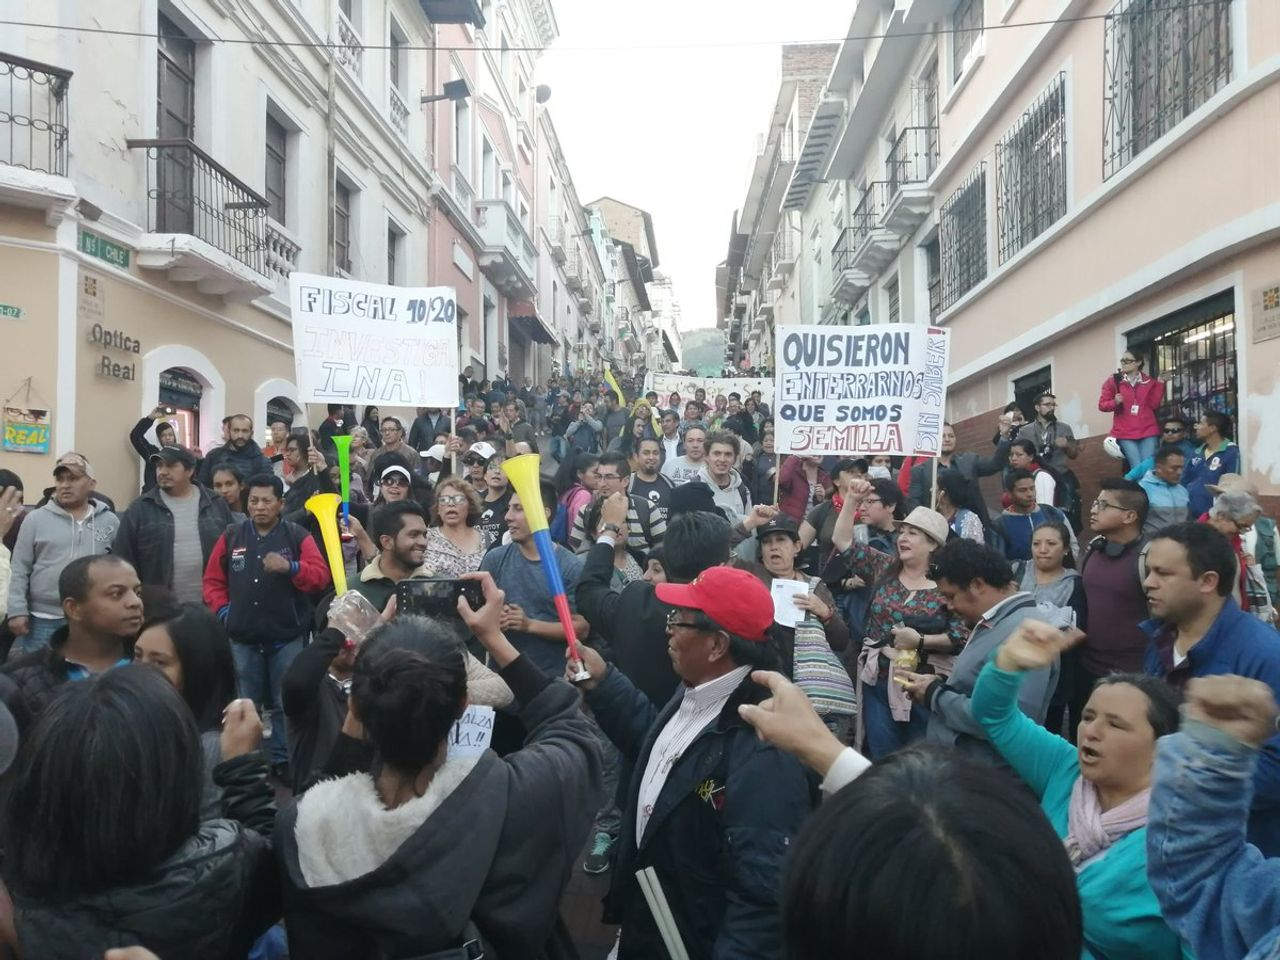 Protesters in Ecuador [Credit: Twitter @KolectiVOZ]